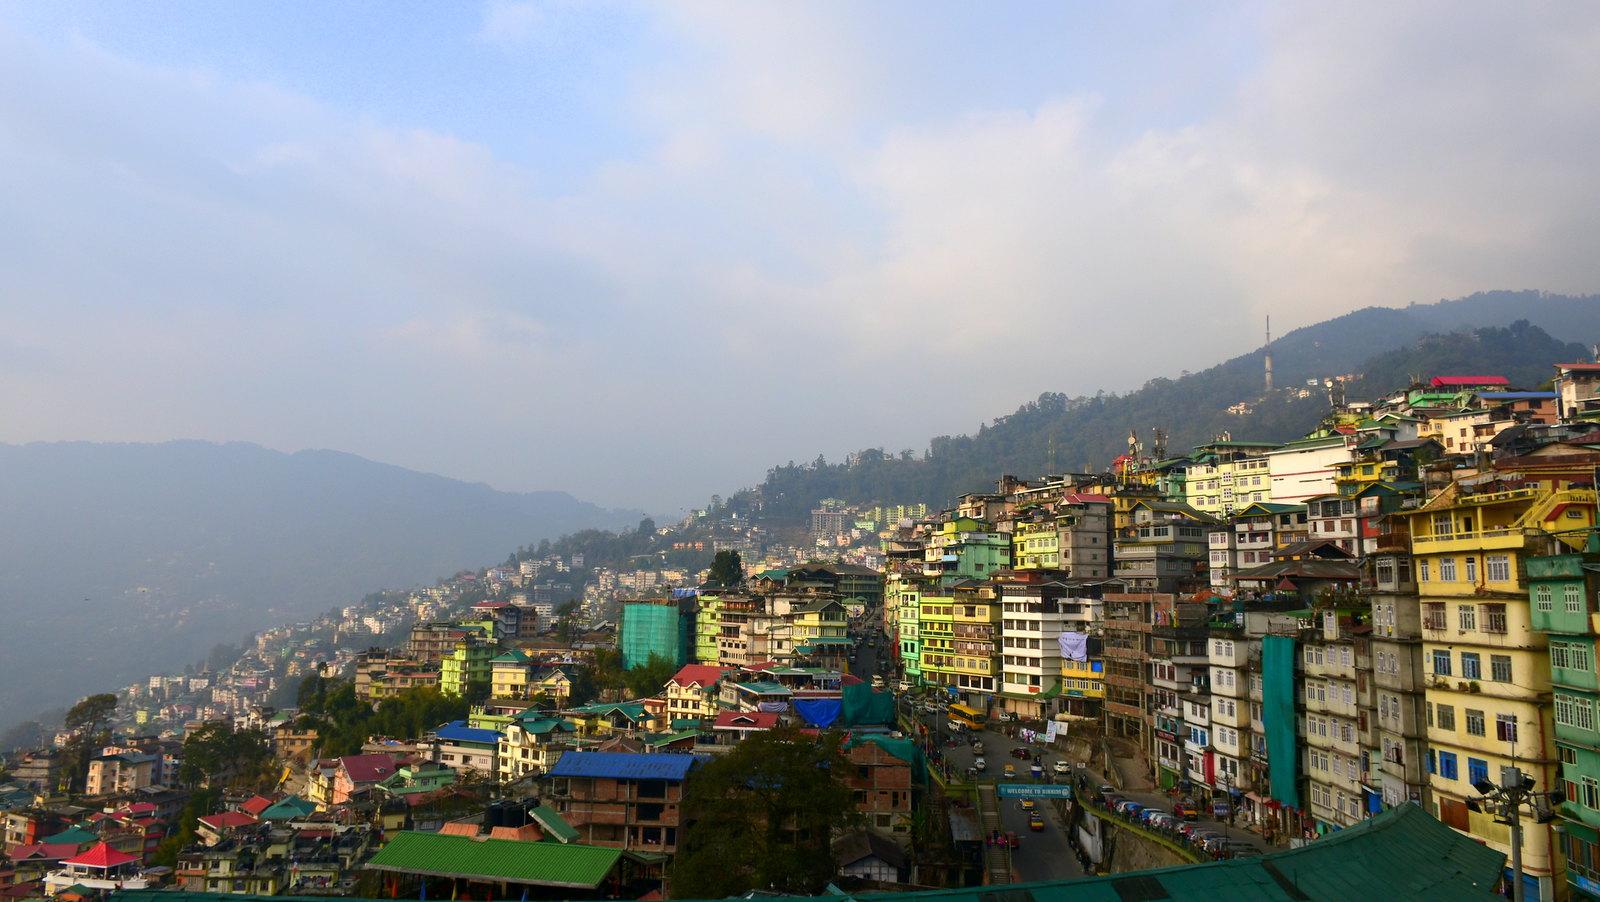 Gangtok, the capital of Sikkim. Photo: Rajib Ghosh/Flickr